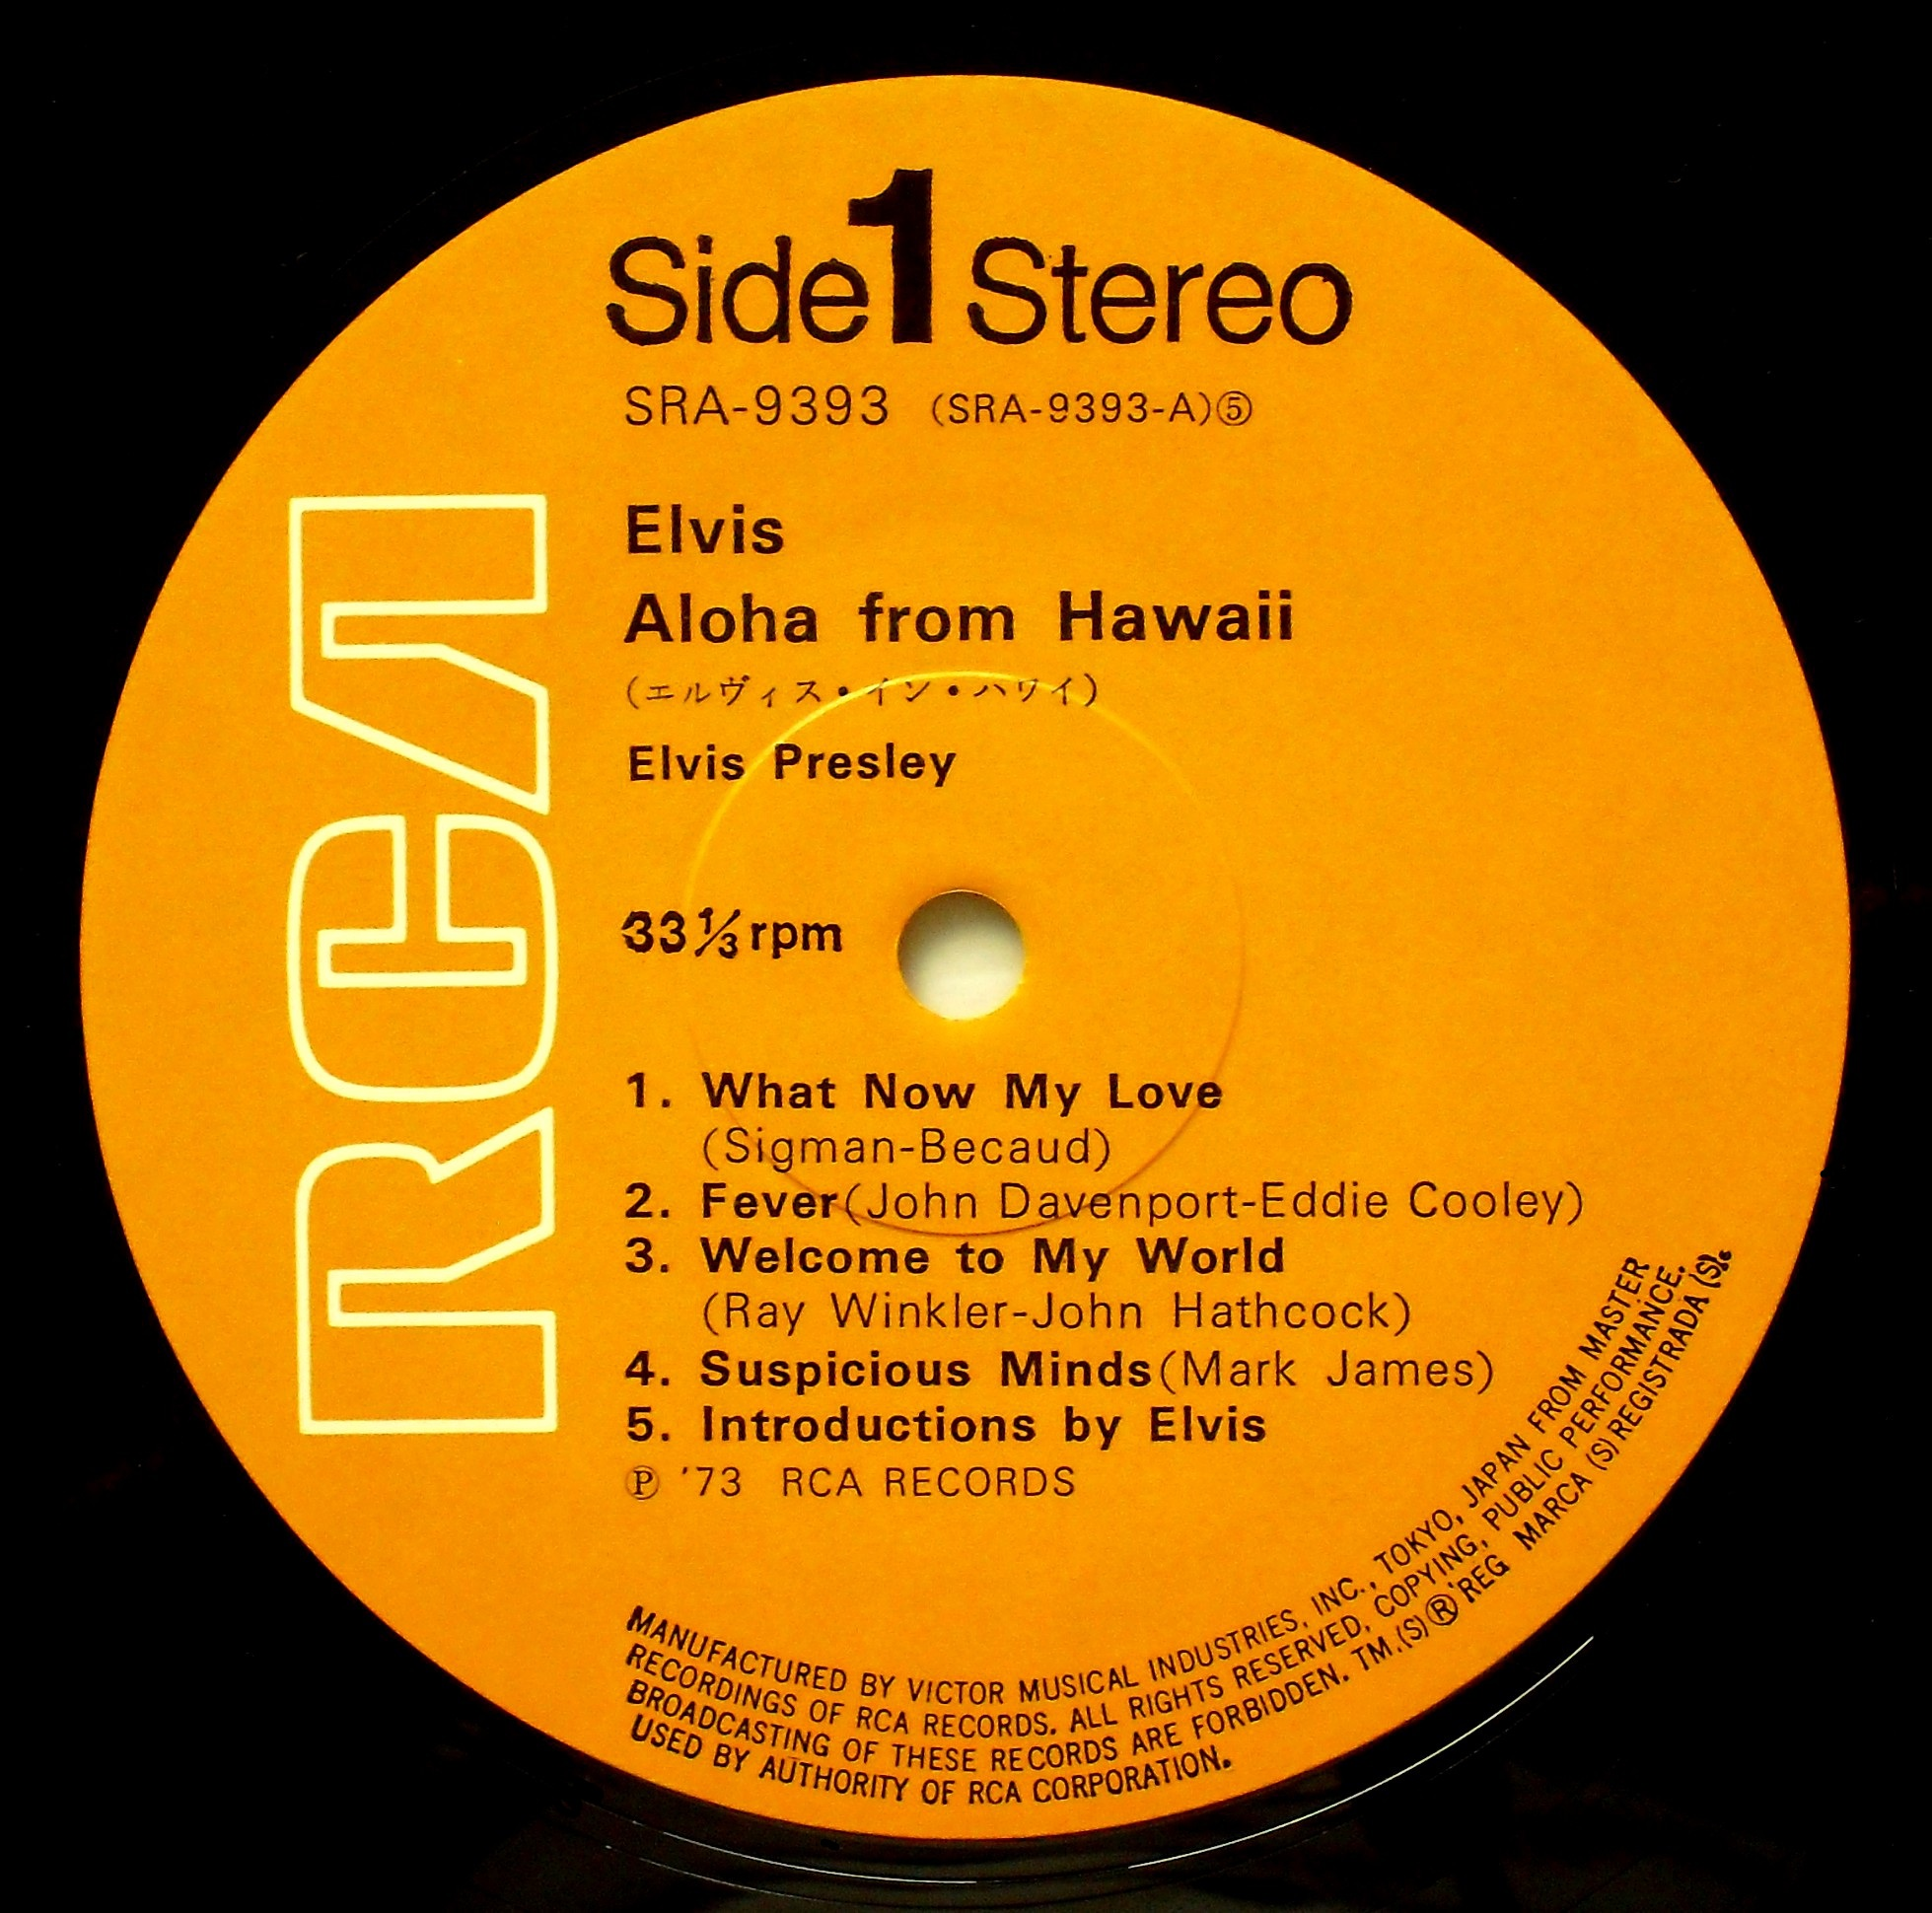 ALOHA FROM HAWAII VIA SATELLITE 04s3kmp2y